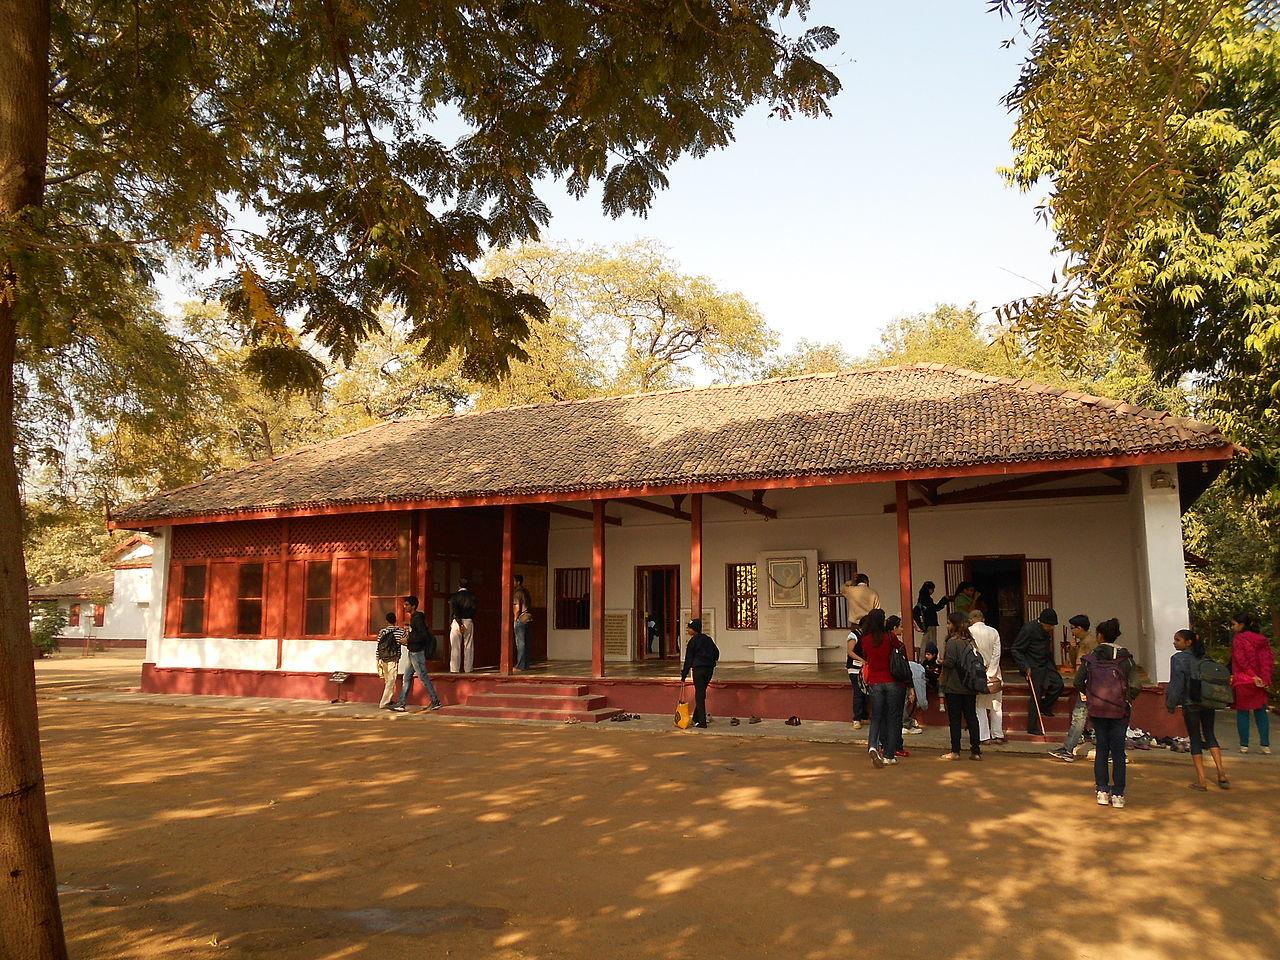 Place to Visit Near Siddi Sayed Mosque-Birthplace of Mahatma Gandhi, Sabarmati